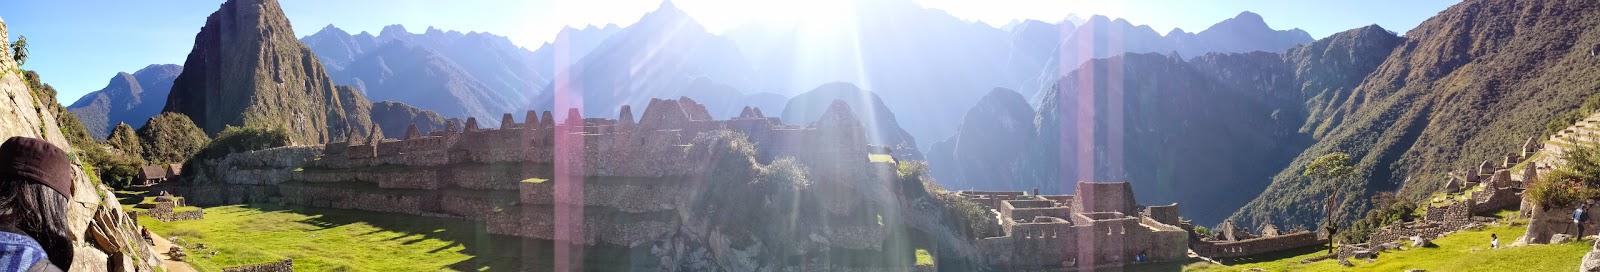 Machu Picchu: Amanecer